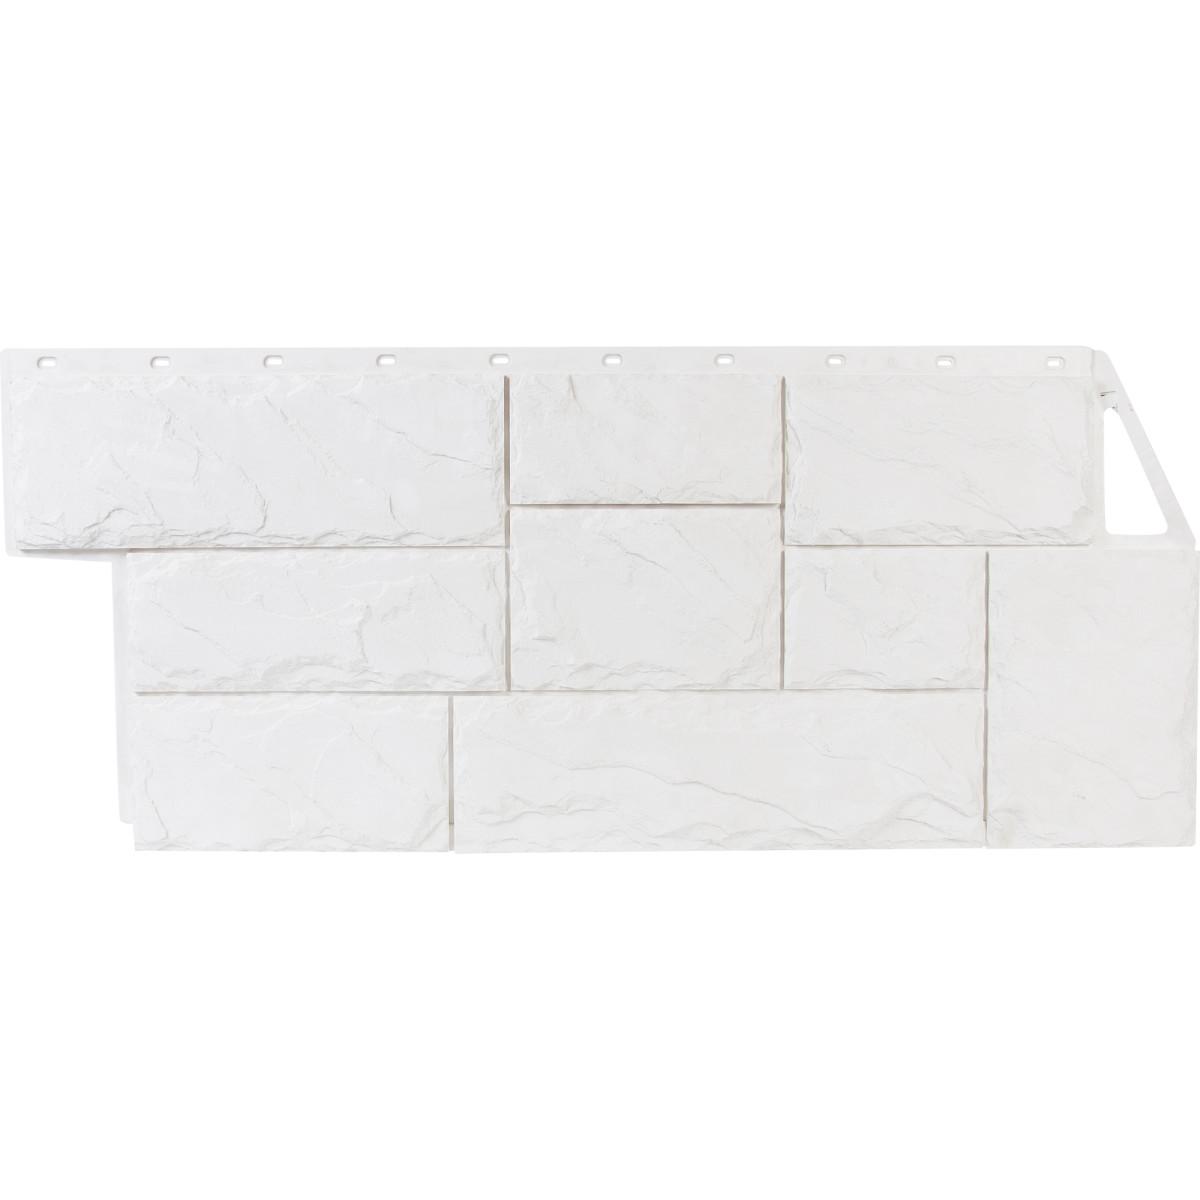 Фасадная панель Country Камень крупный цвет белый